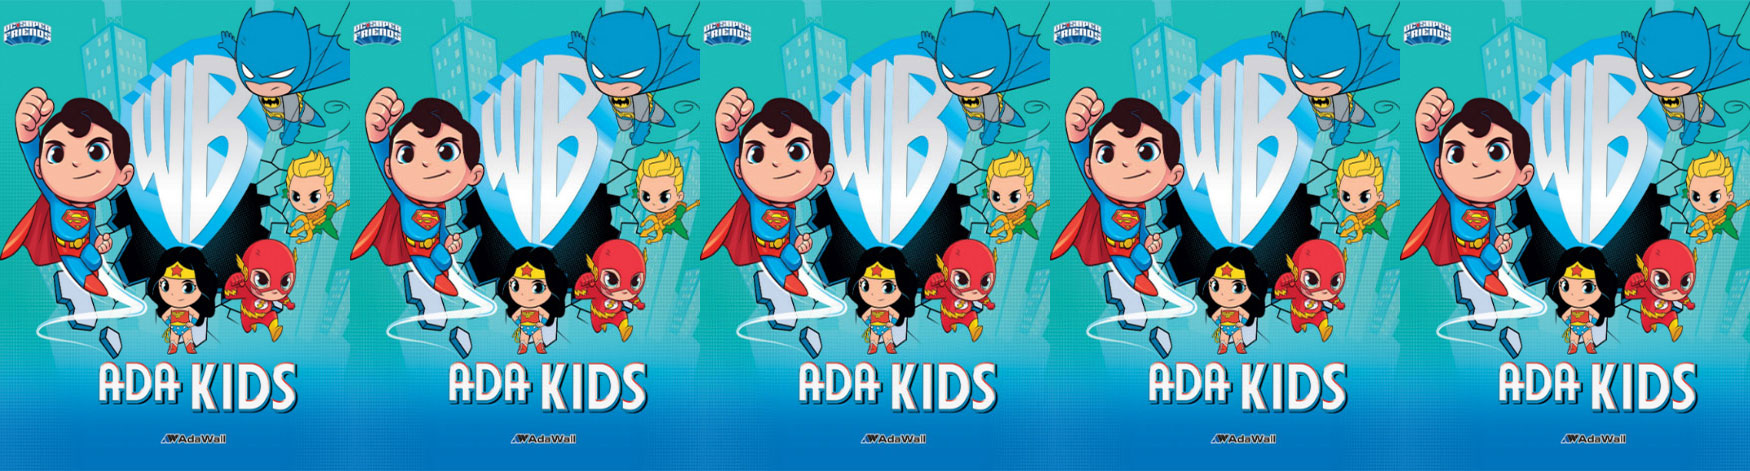 Tapet lavabil vinilic Ada Kids poster